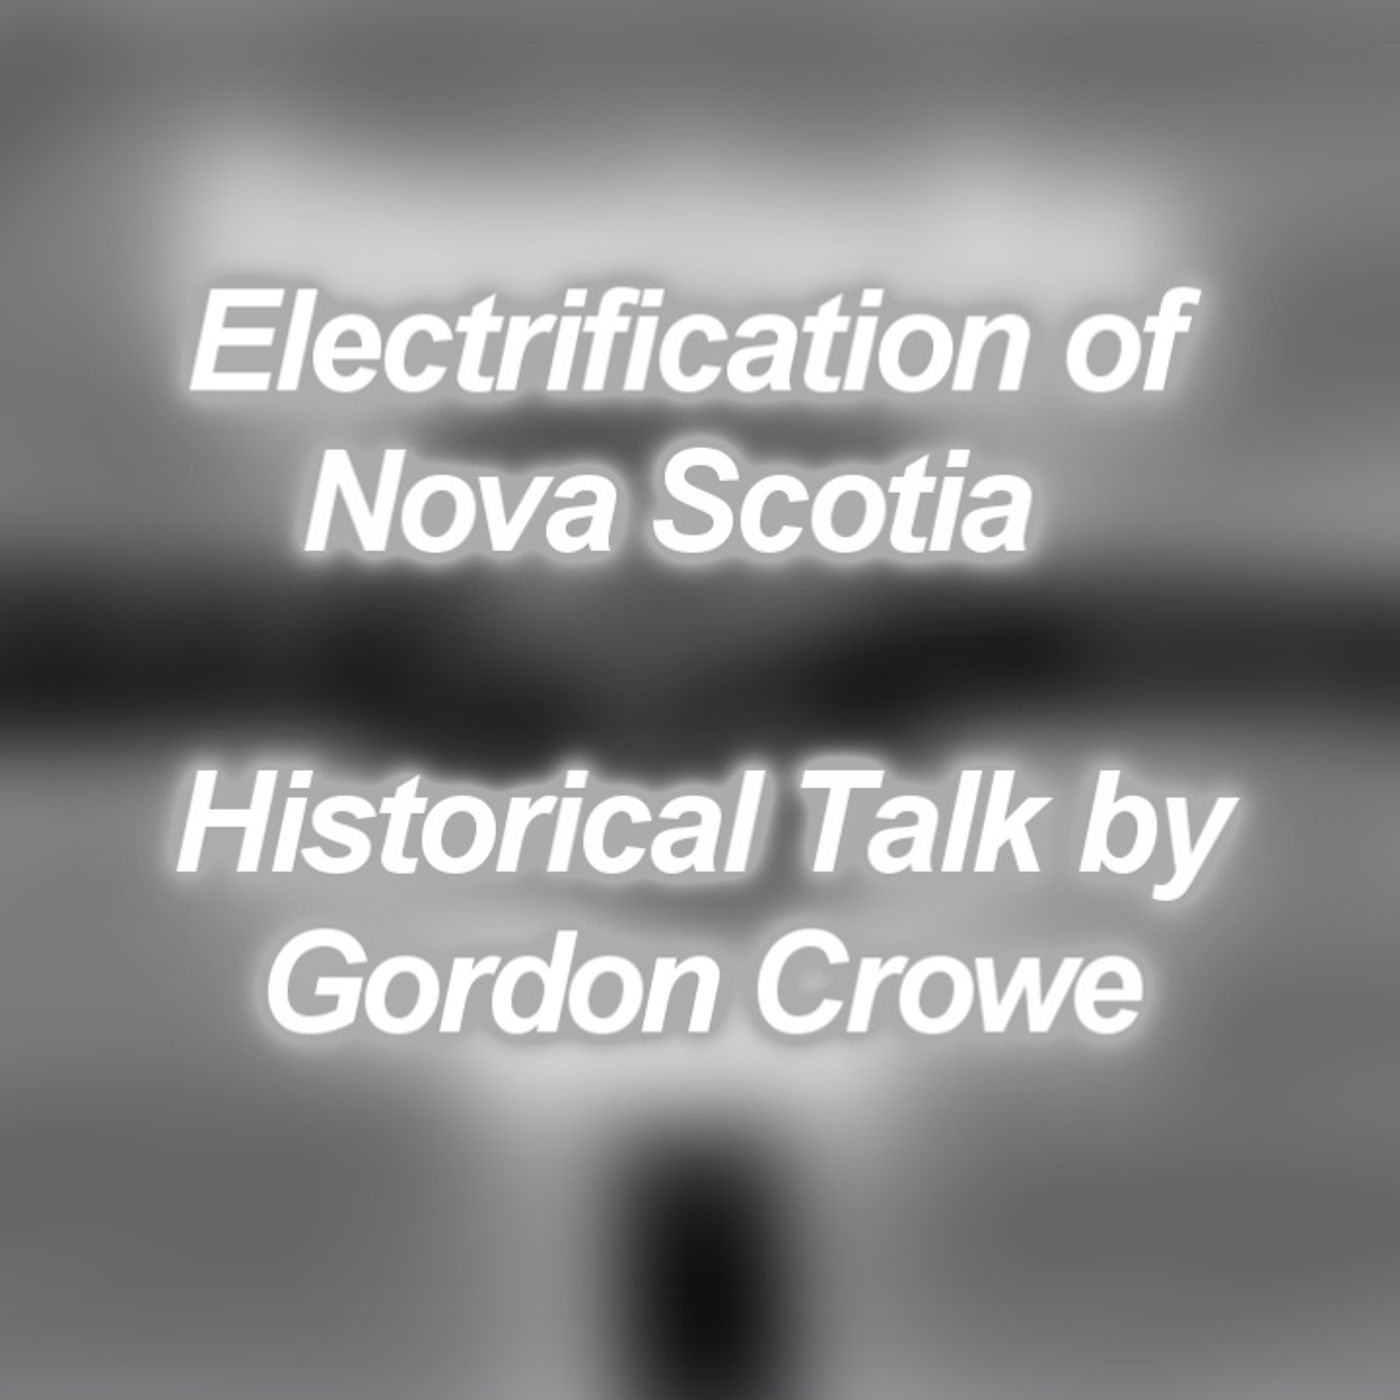 Electrification of Nova Scotia